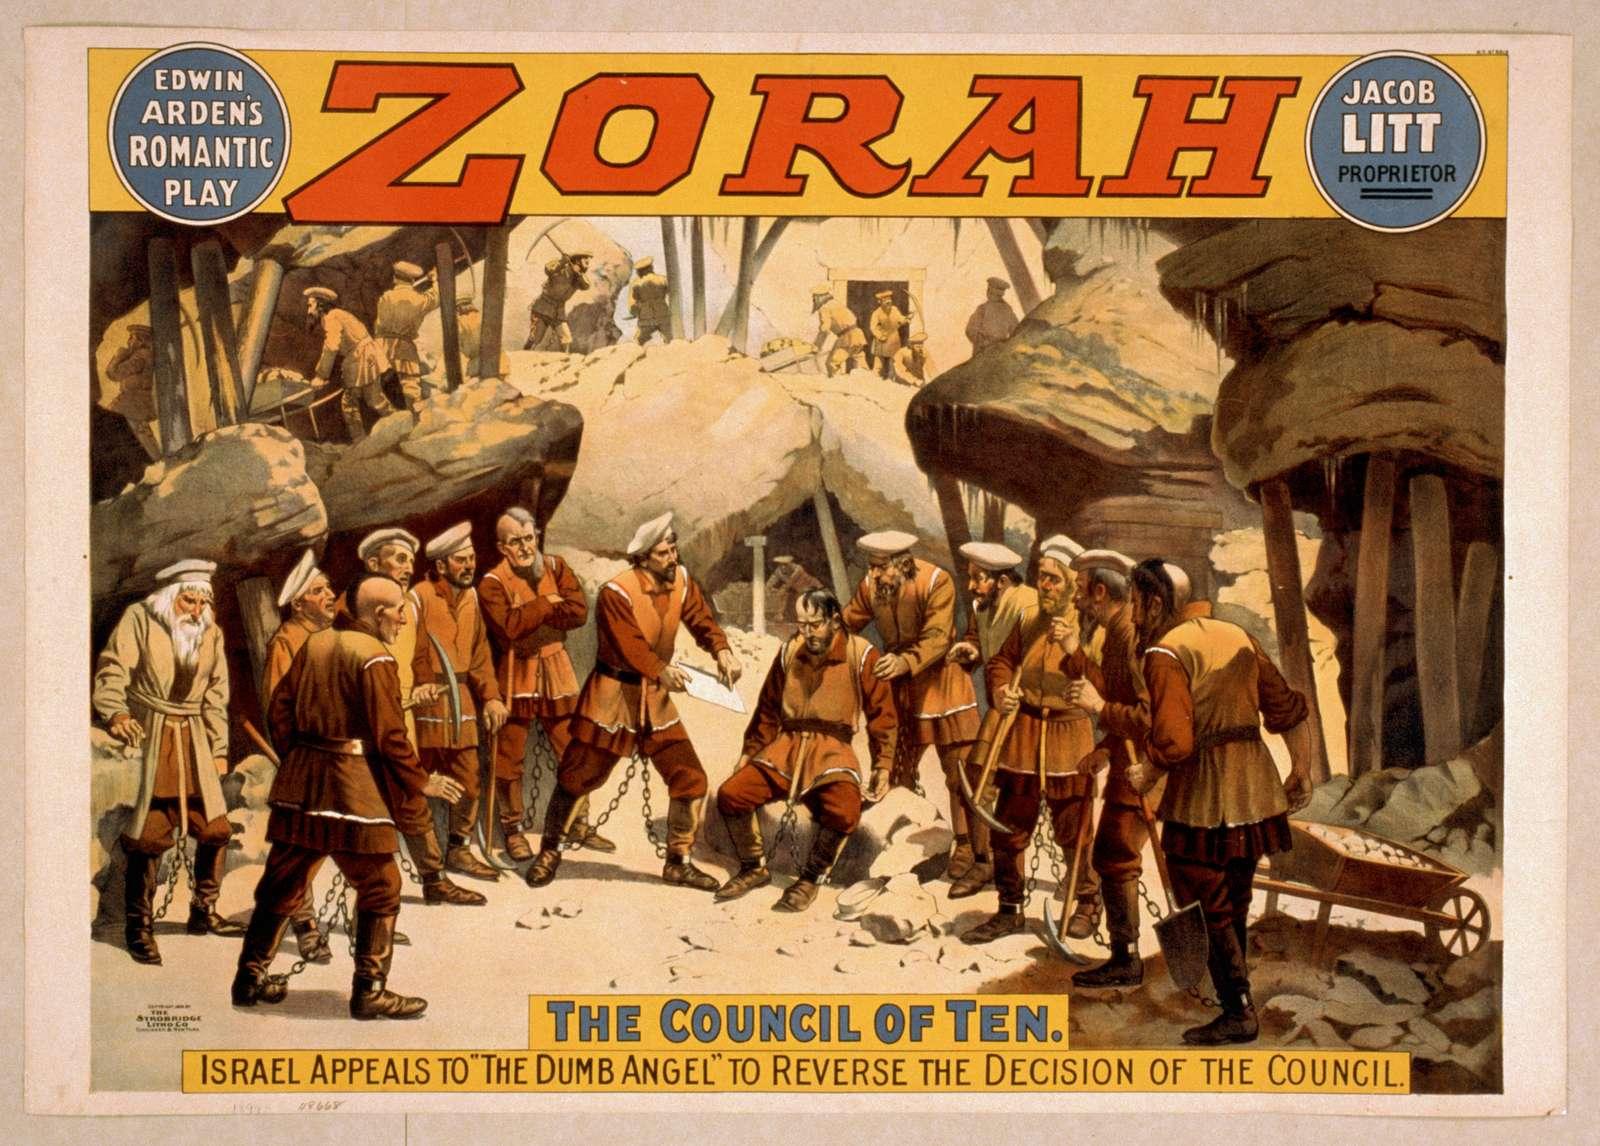 Edwin Arden's romantic play, Zorah